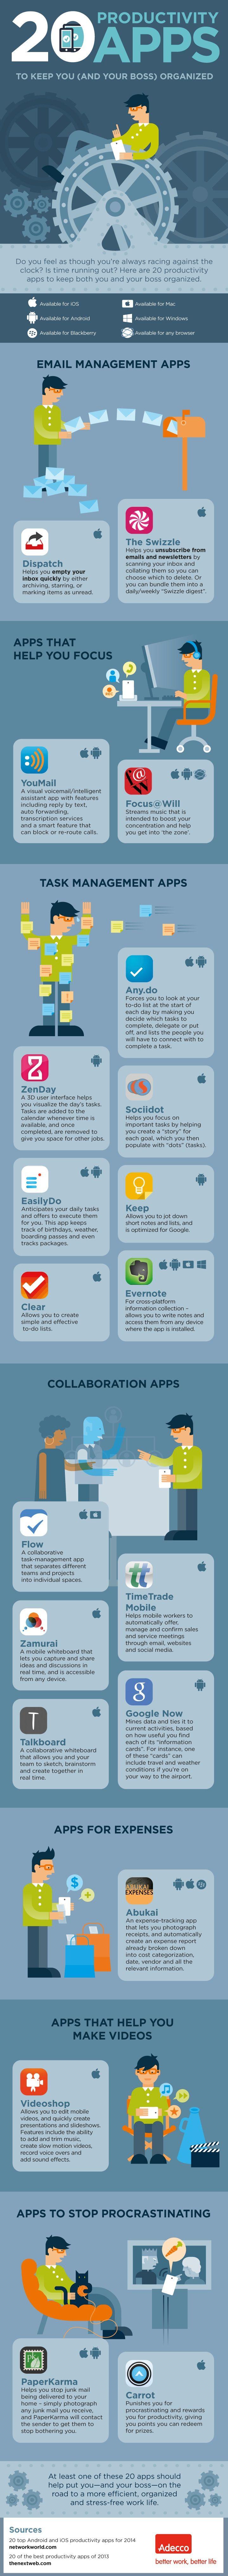 best productivity apps-techfavicon